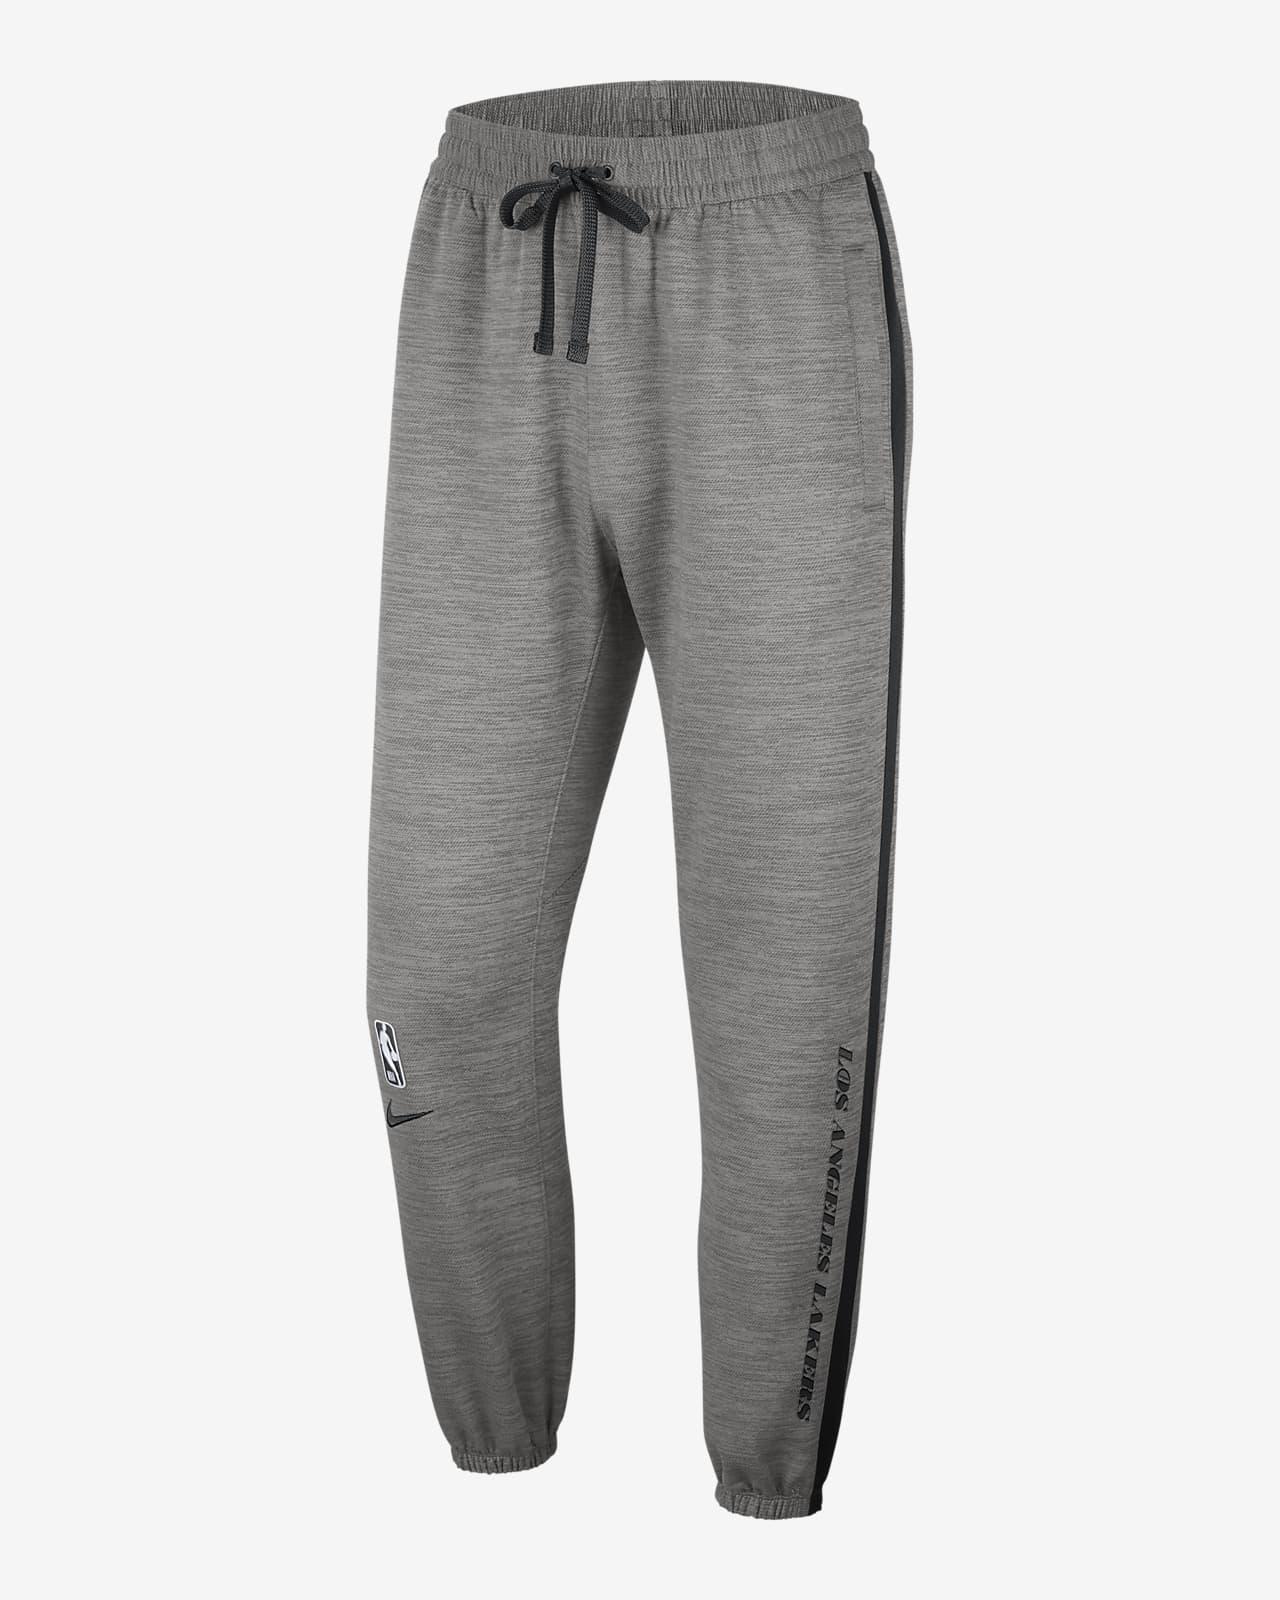 洛杉矶湖人队 Showtime Nike Therma Flex NBA 男子长裤